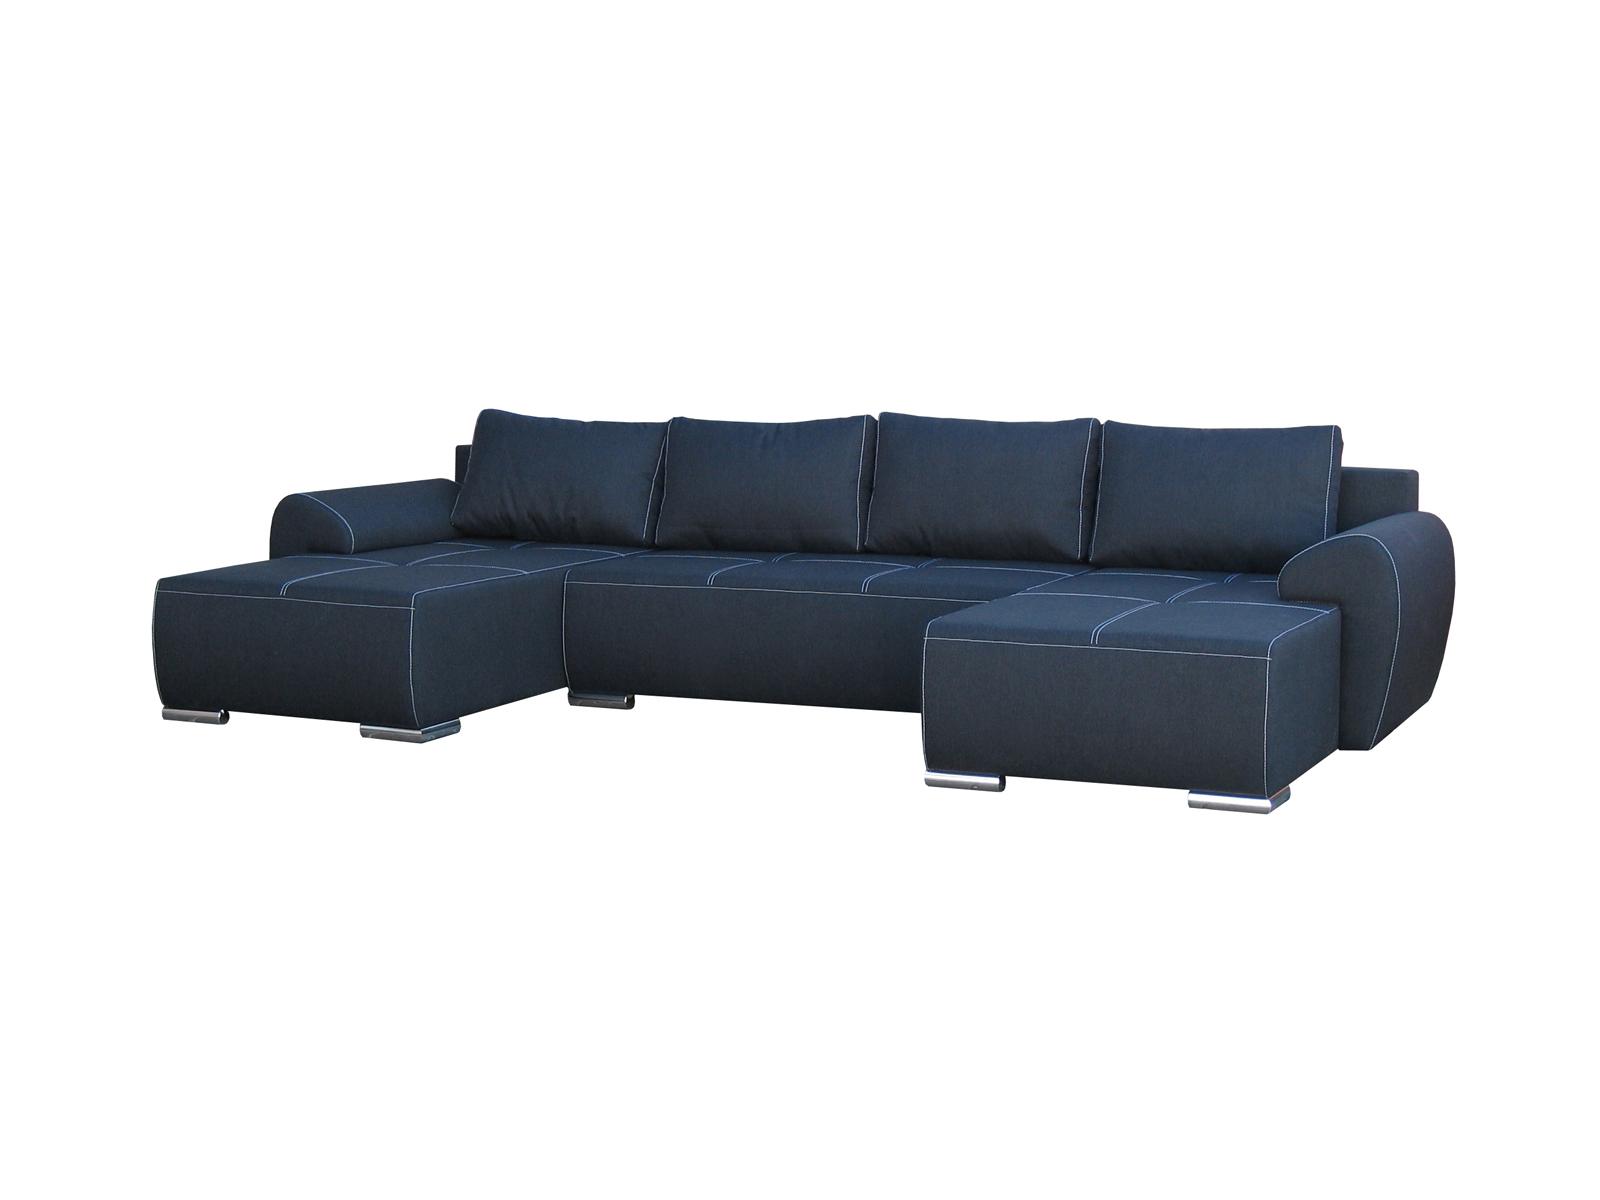 Rohová sedací souprava U - Po-Sed - Lucy U (modrá) (P)